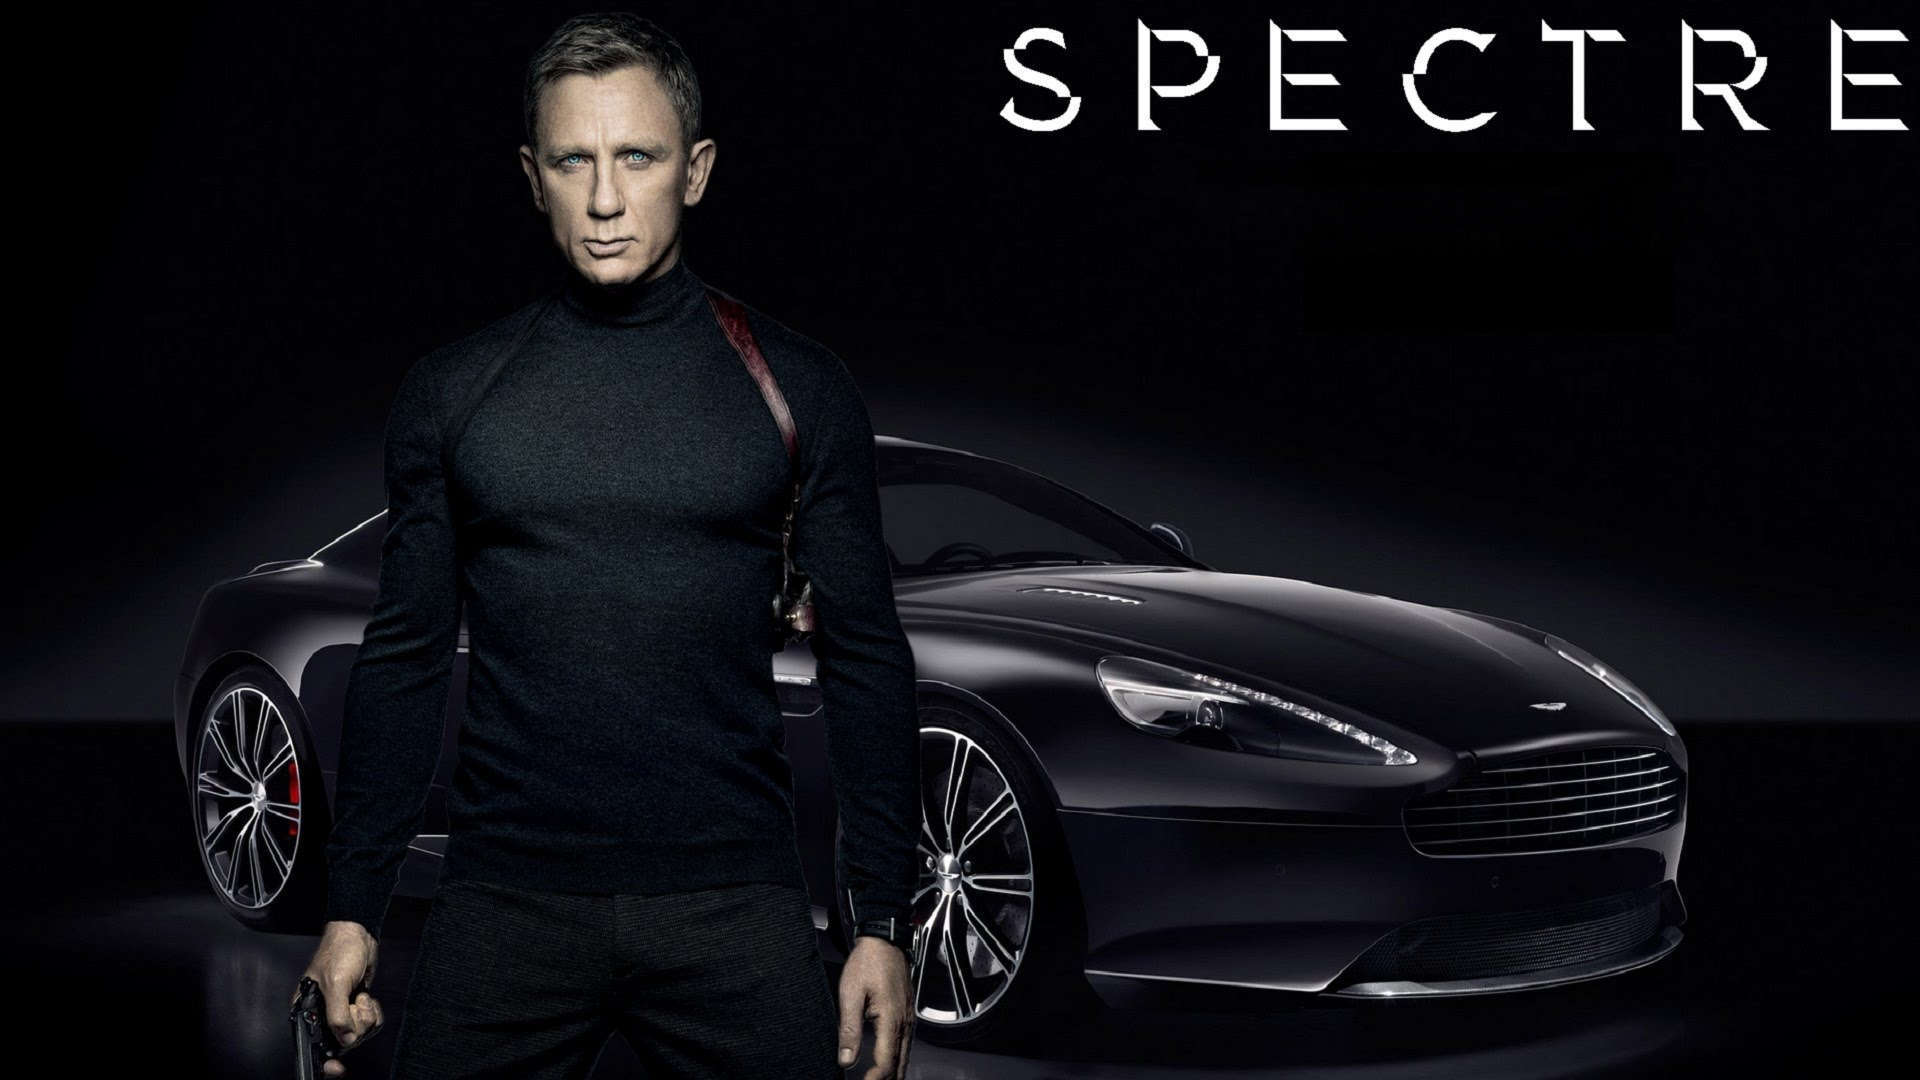 James Bond Spectre HD Wallpaper - WallpaperSafari